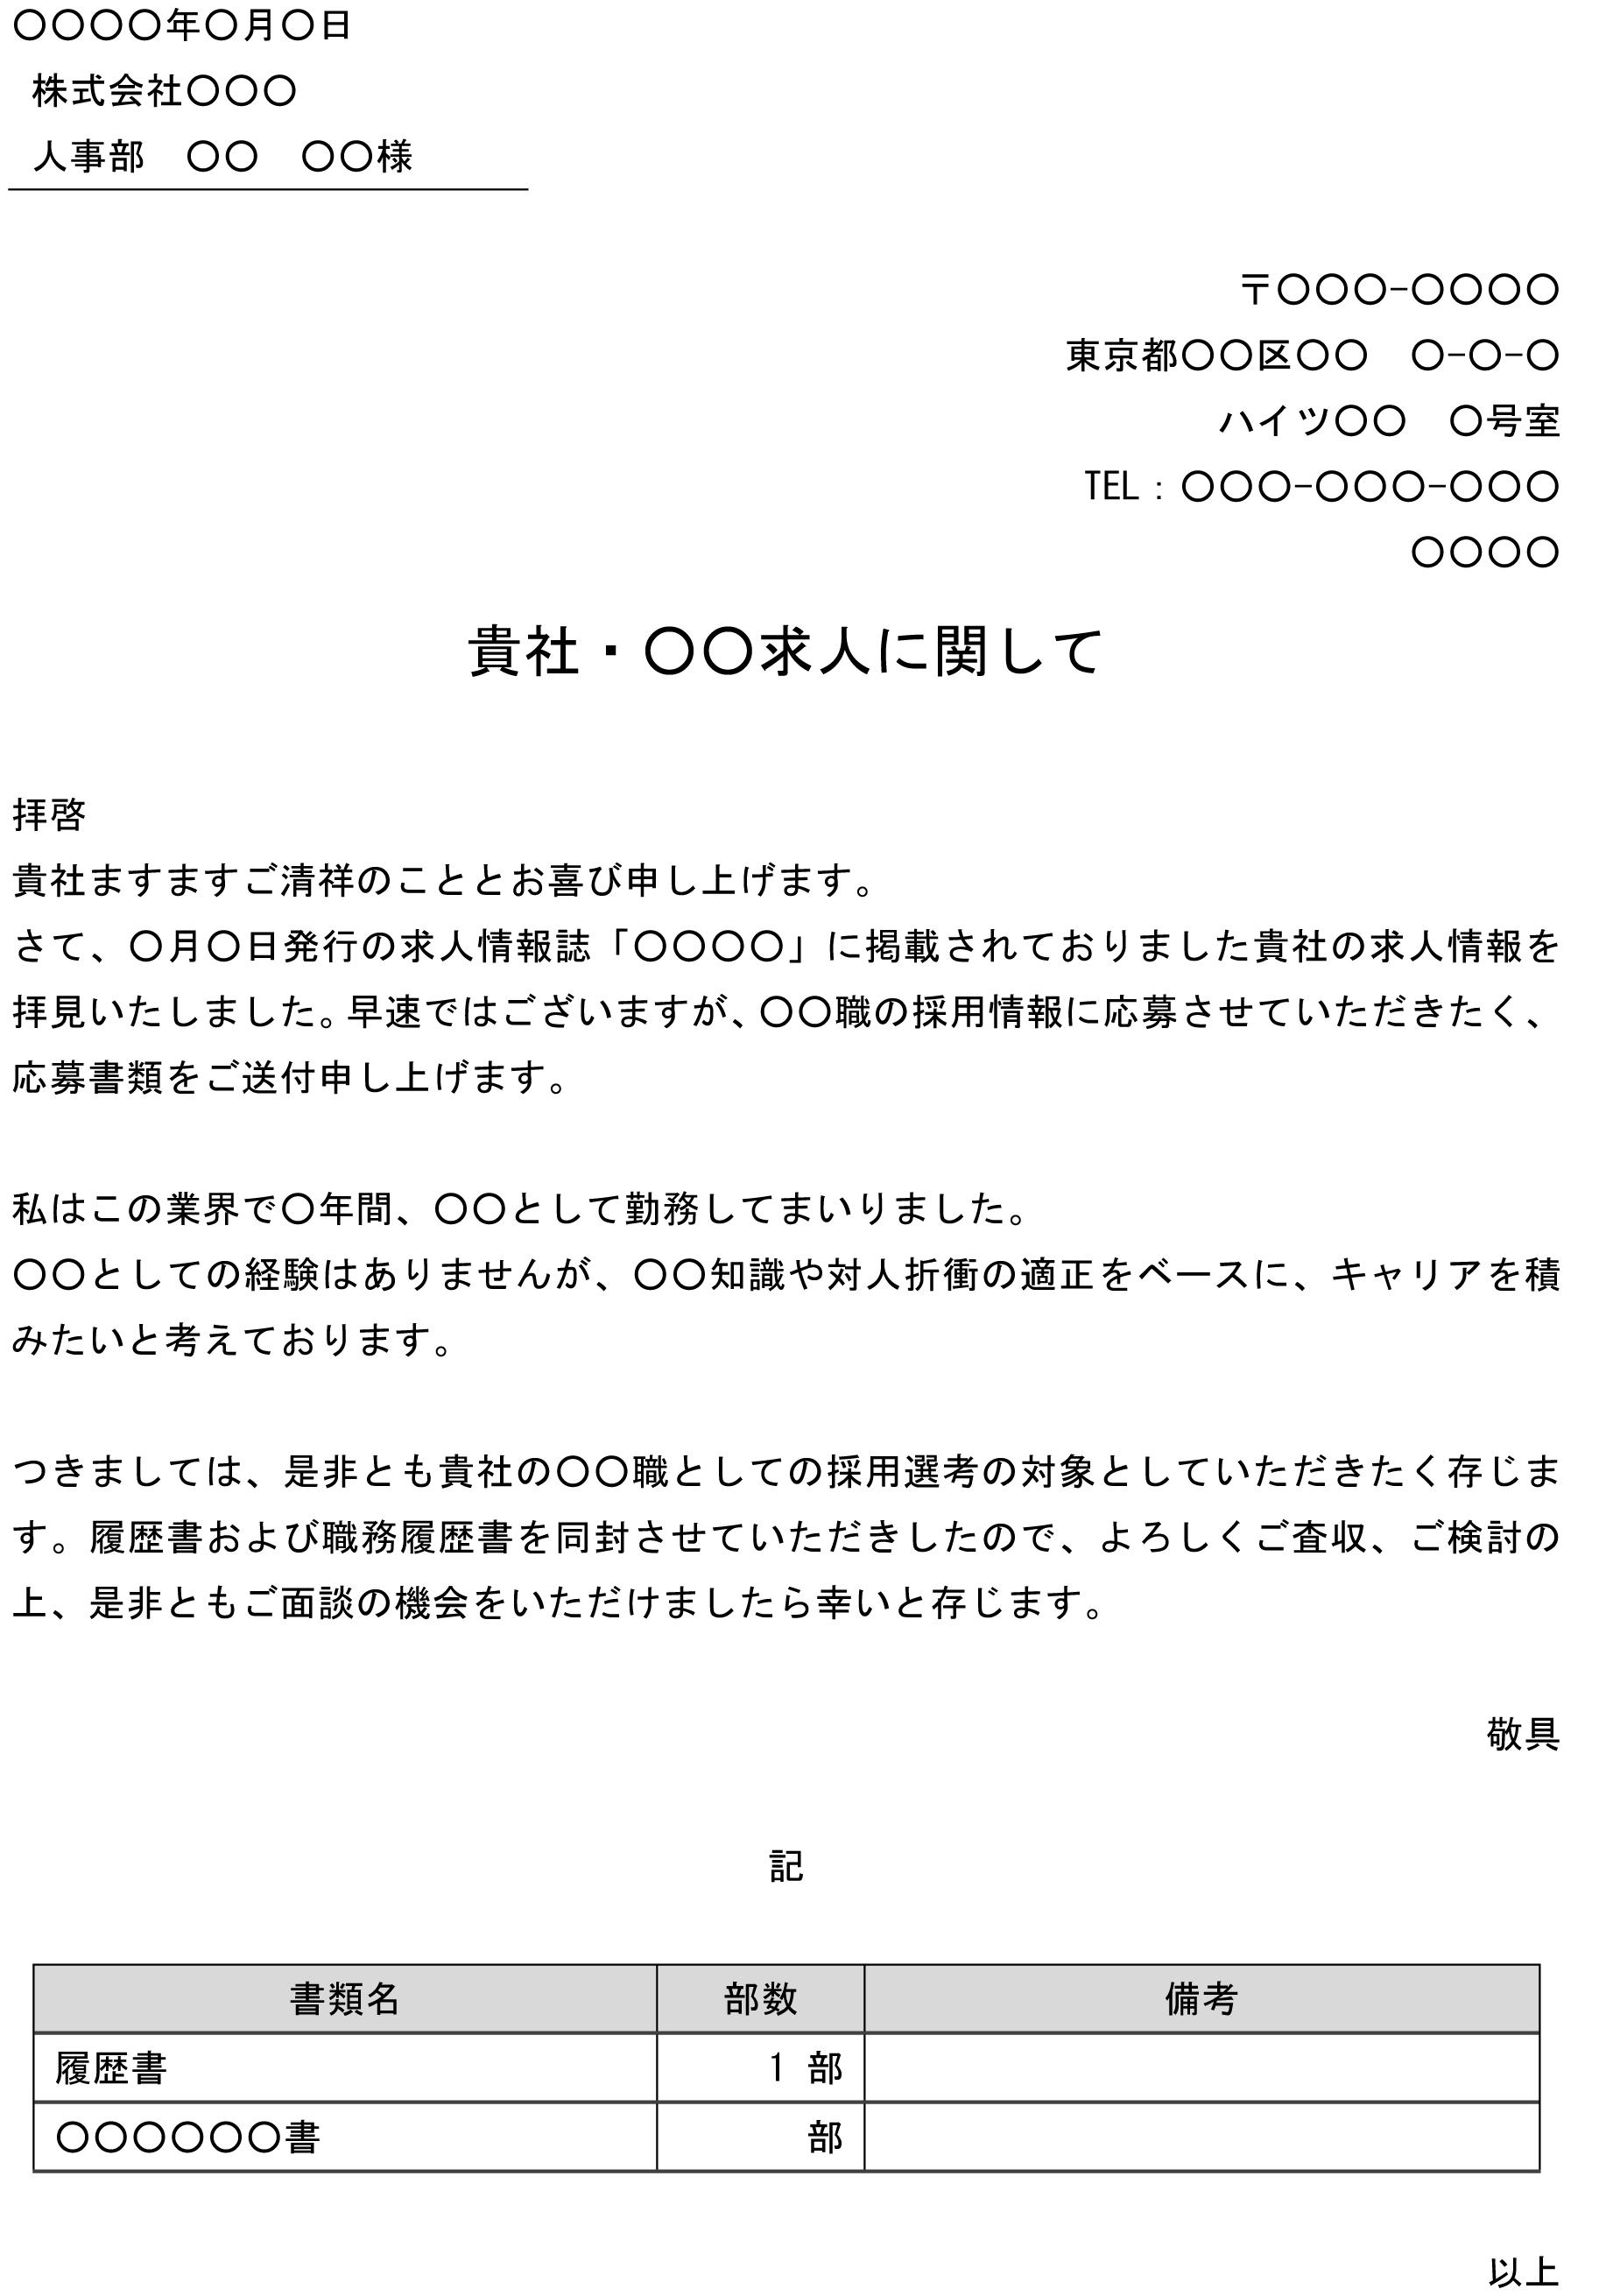 送付状(求人情報誌掲載の中途採用情報に応募)